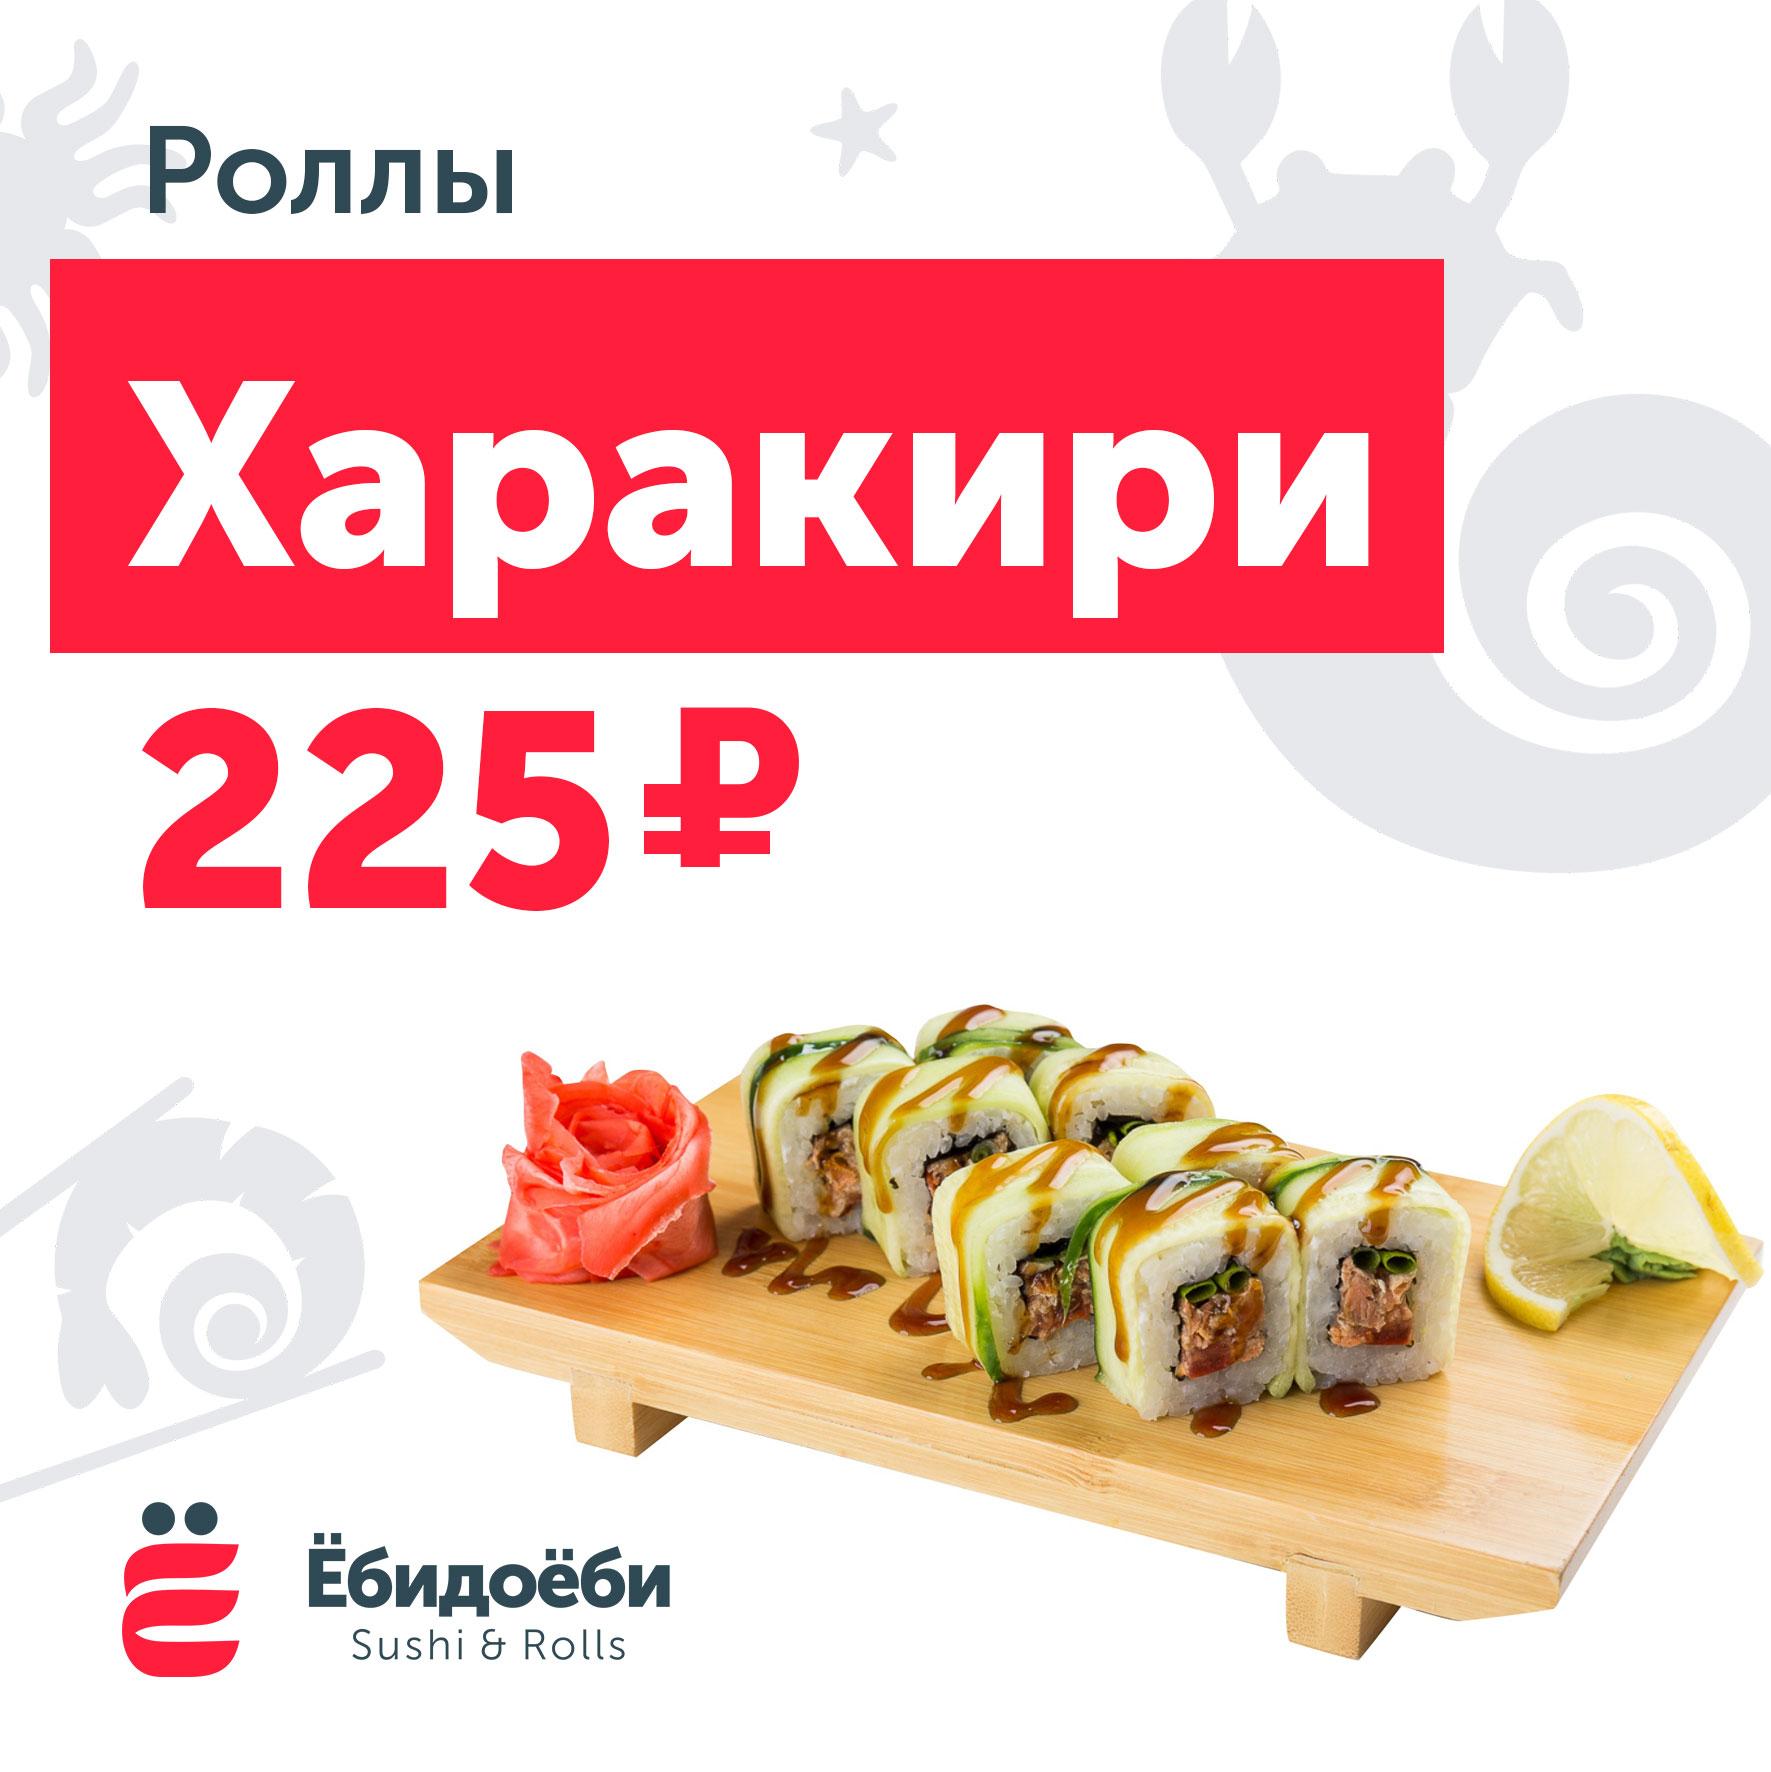 Суши-бар, доставка «ЁбиДоёби» - Вконтакте